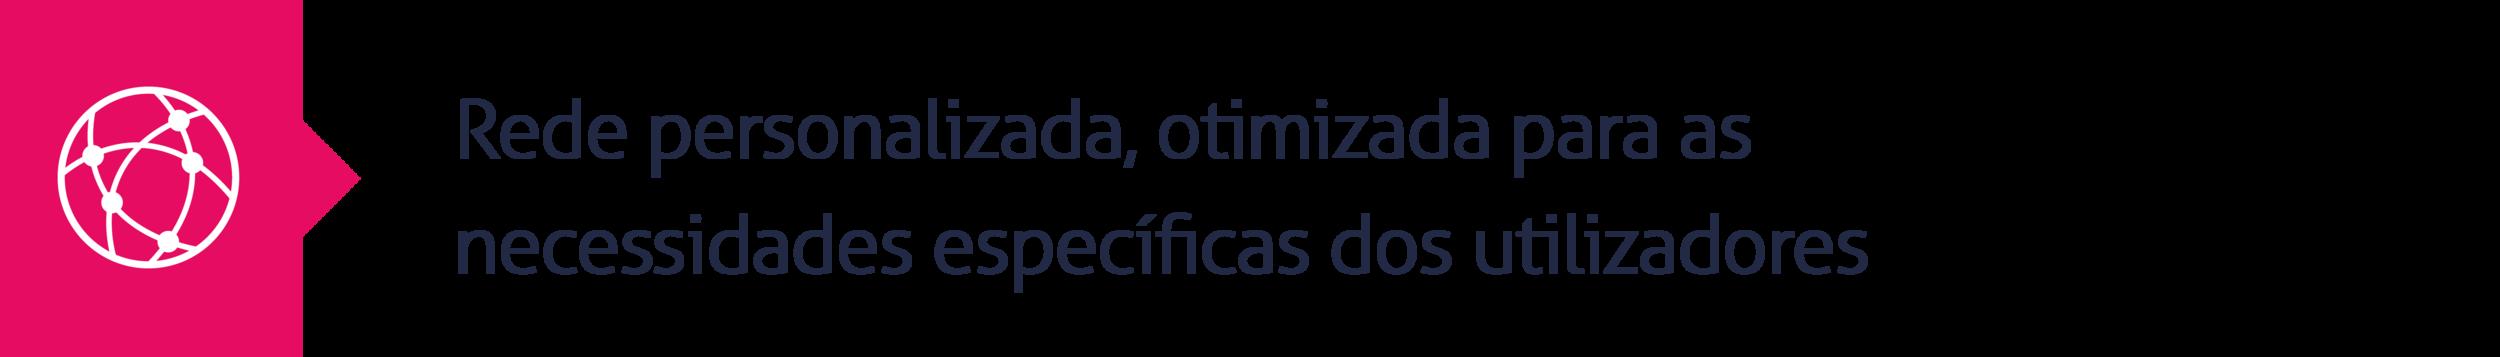 12.Rede personalizada, otimizada para as necessidades específicas dos utilizadores